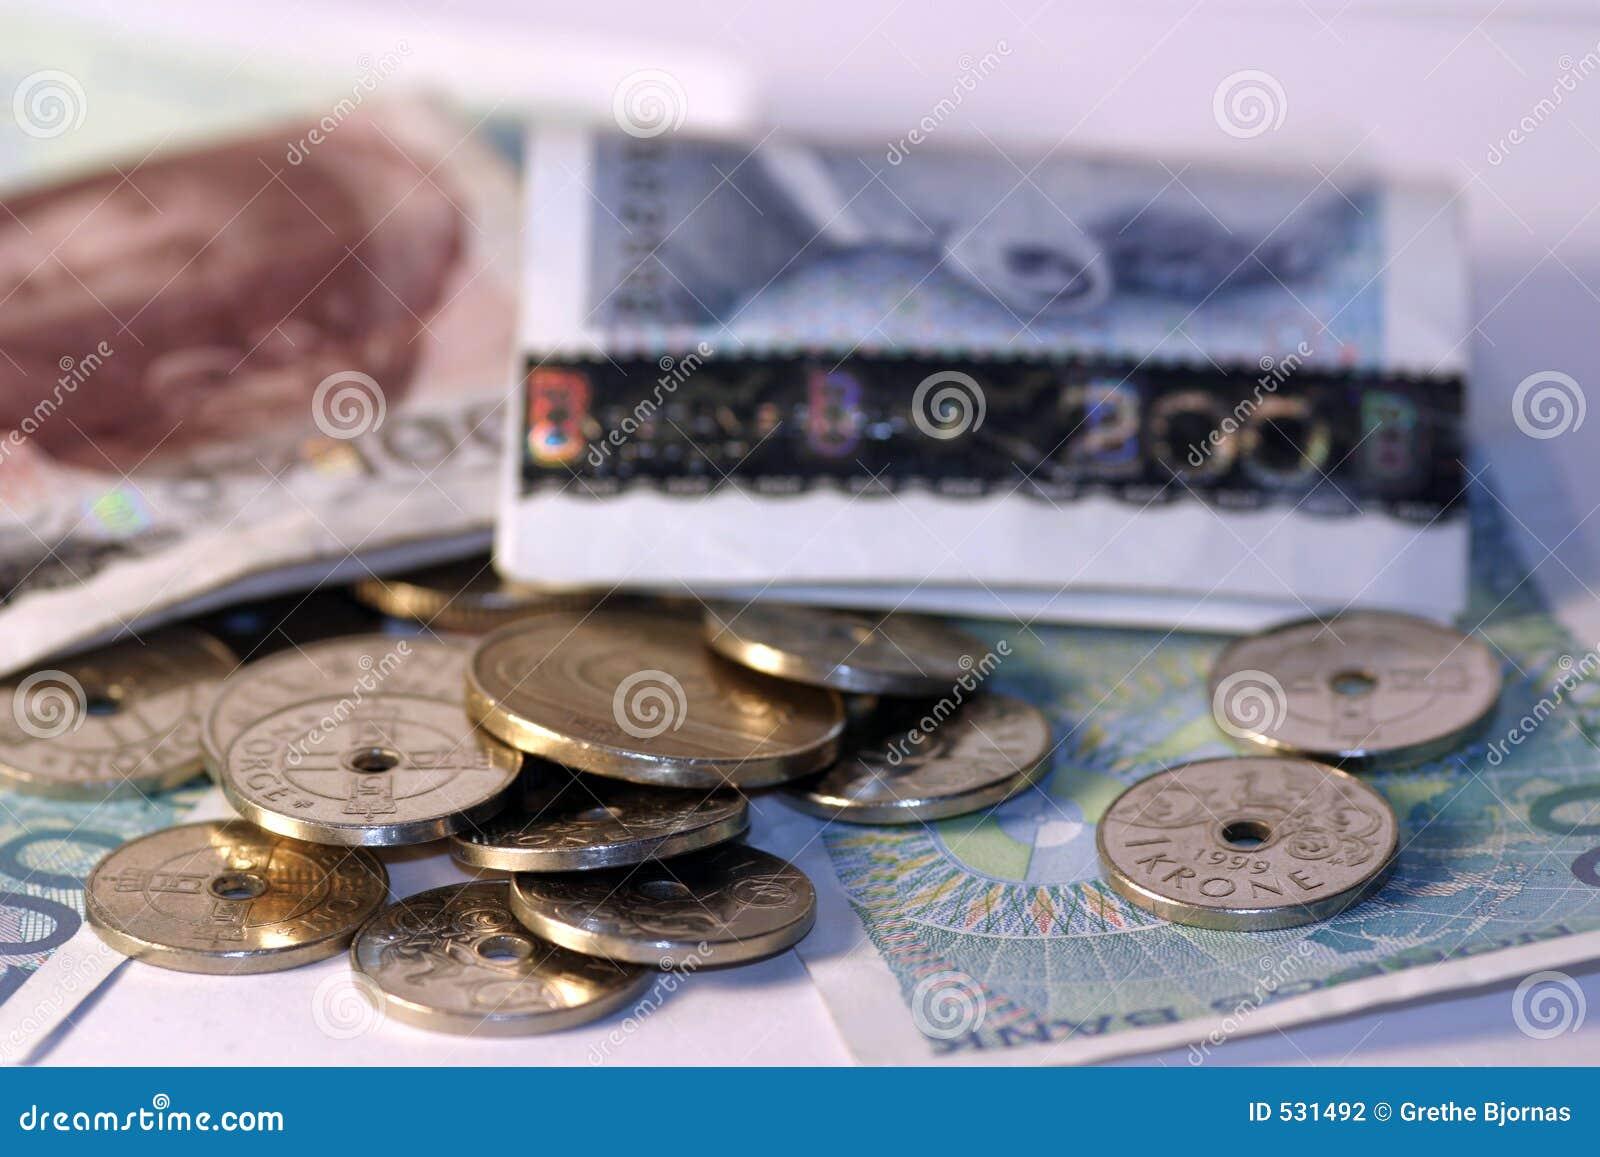 Download 货币挪威 库存照片. 图片 包括有 批次, 硬币, 储蓄, 苍白, 货币, 商业, 特写镜头, 购买, 财务 - 531492